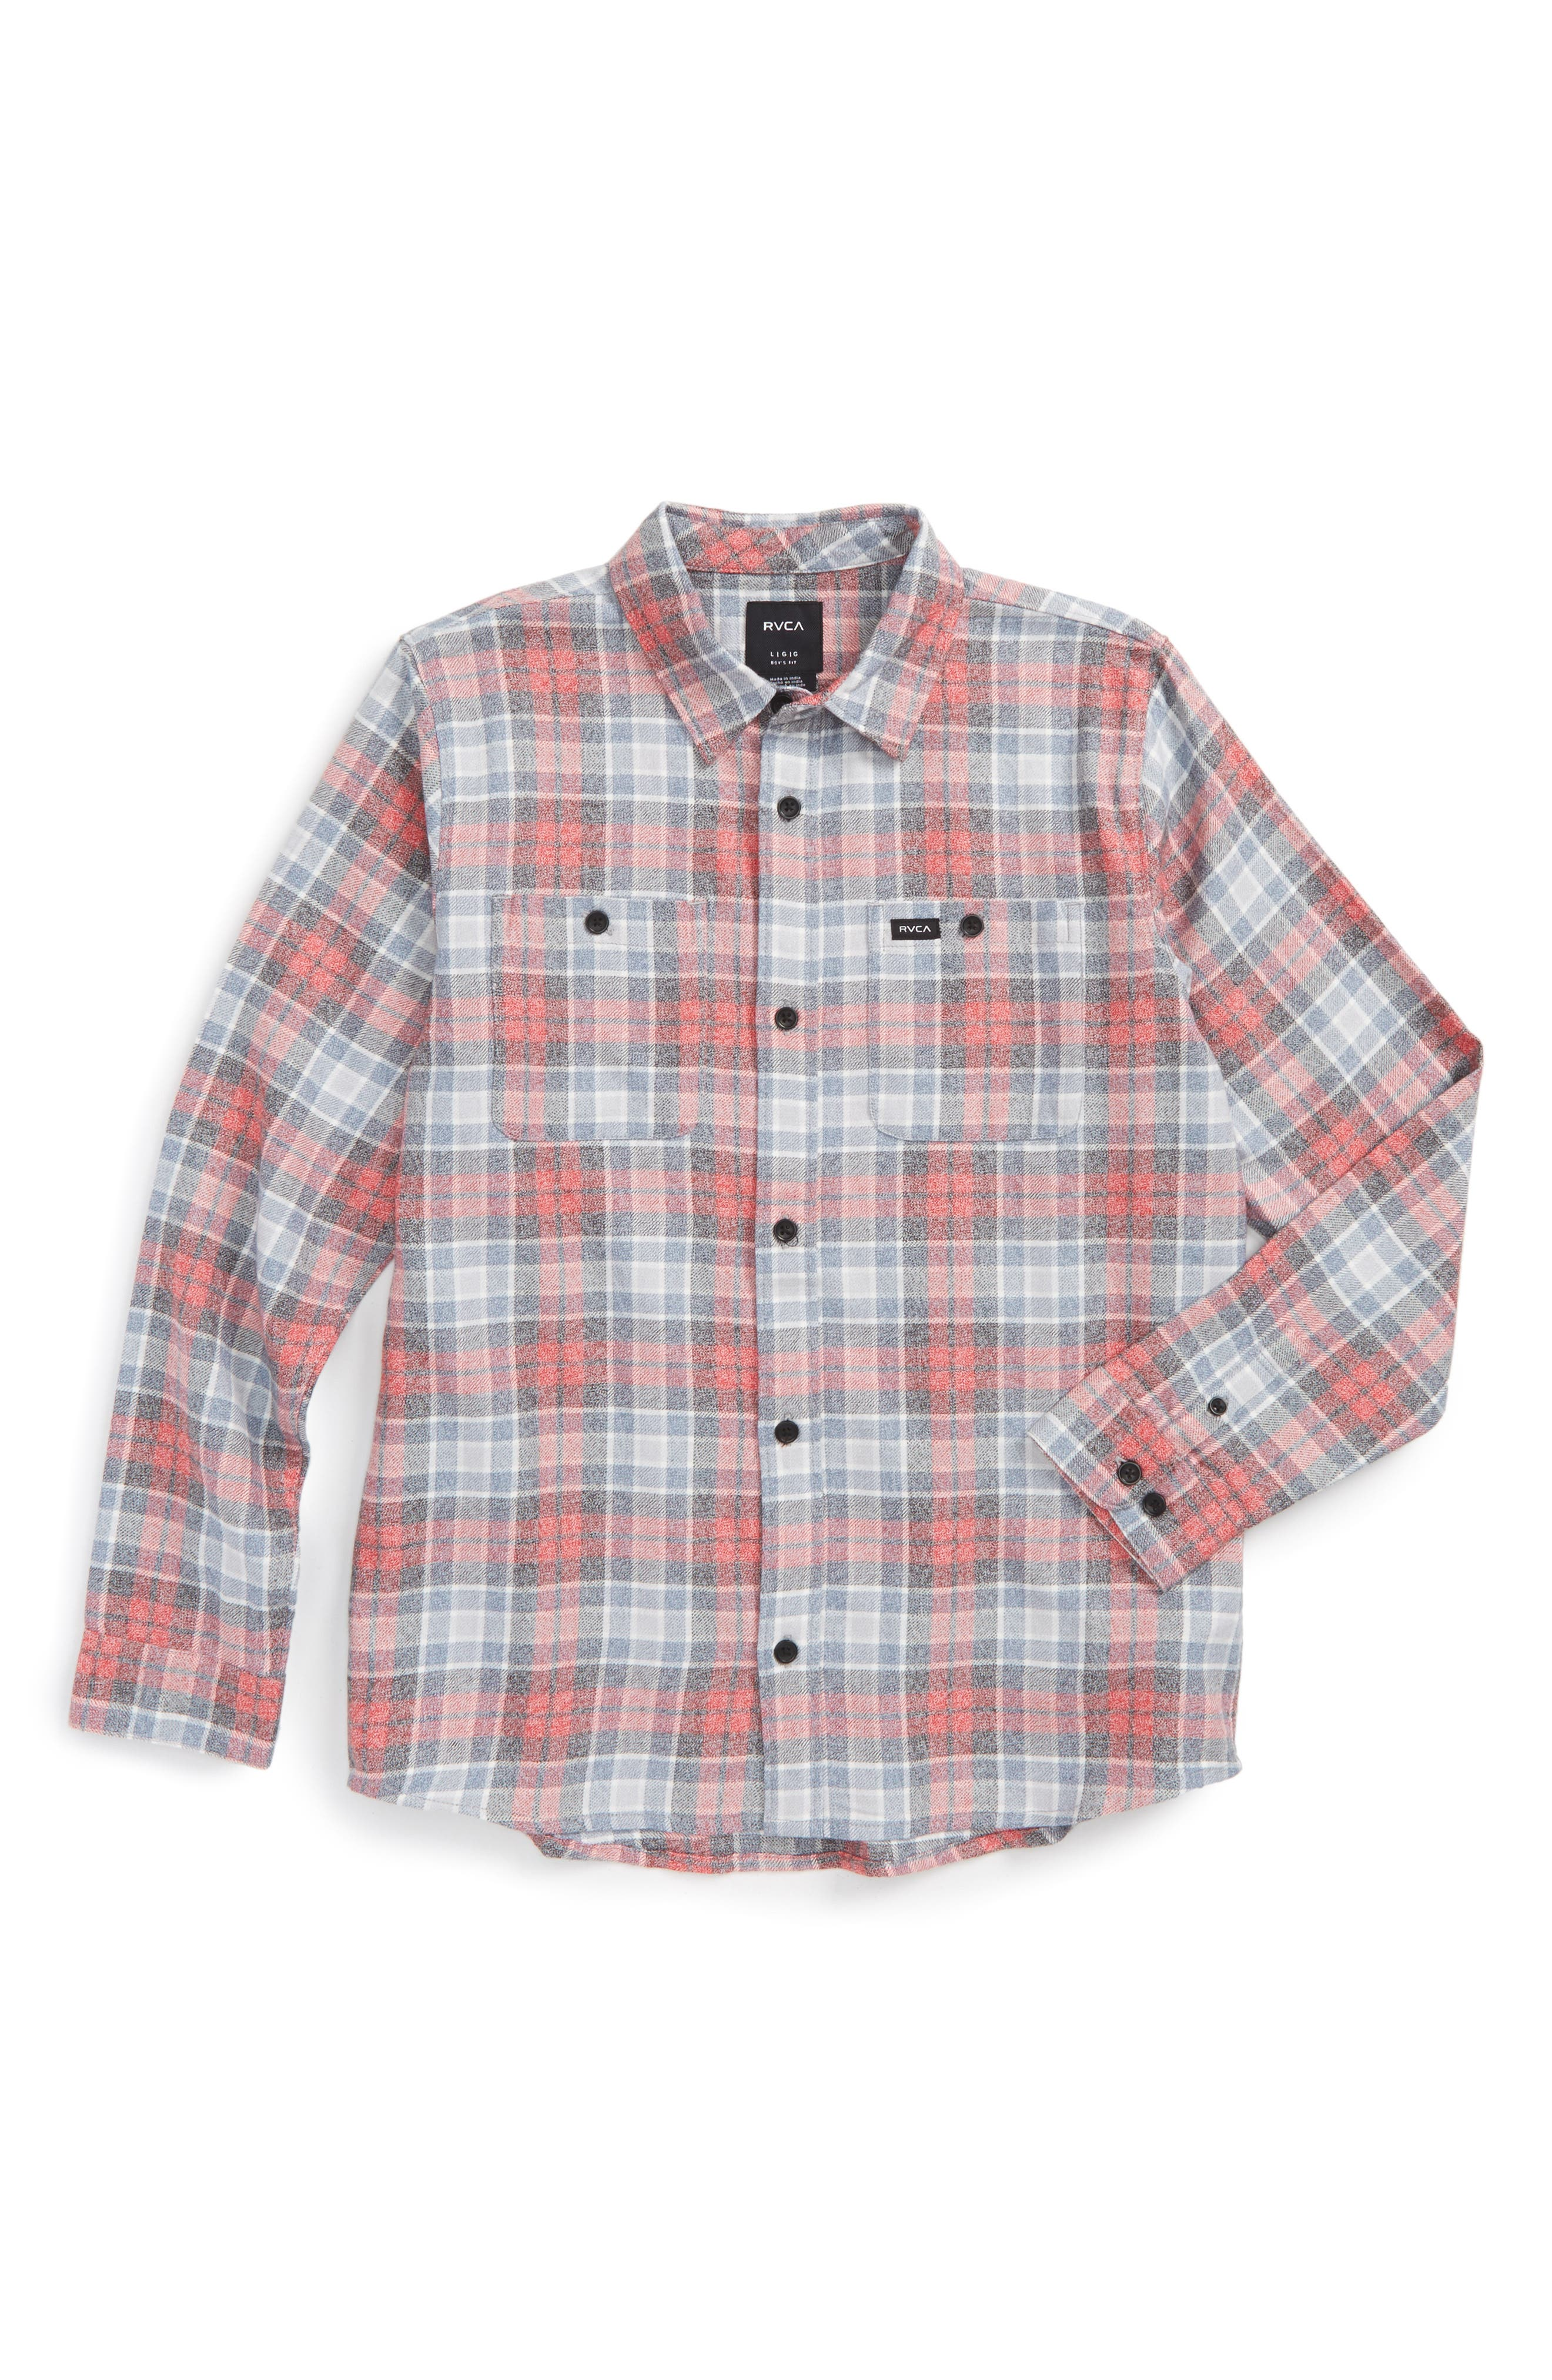 Main Image - RVCA Diffusion Plaid Shirt (Big Boys)